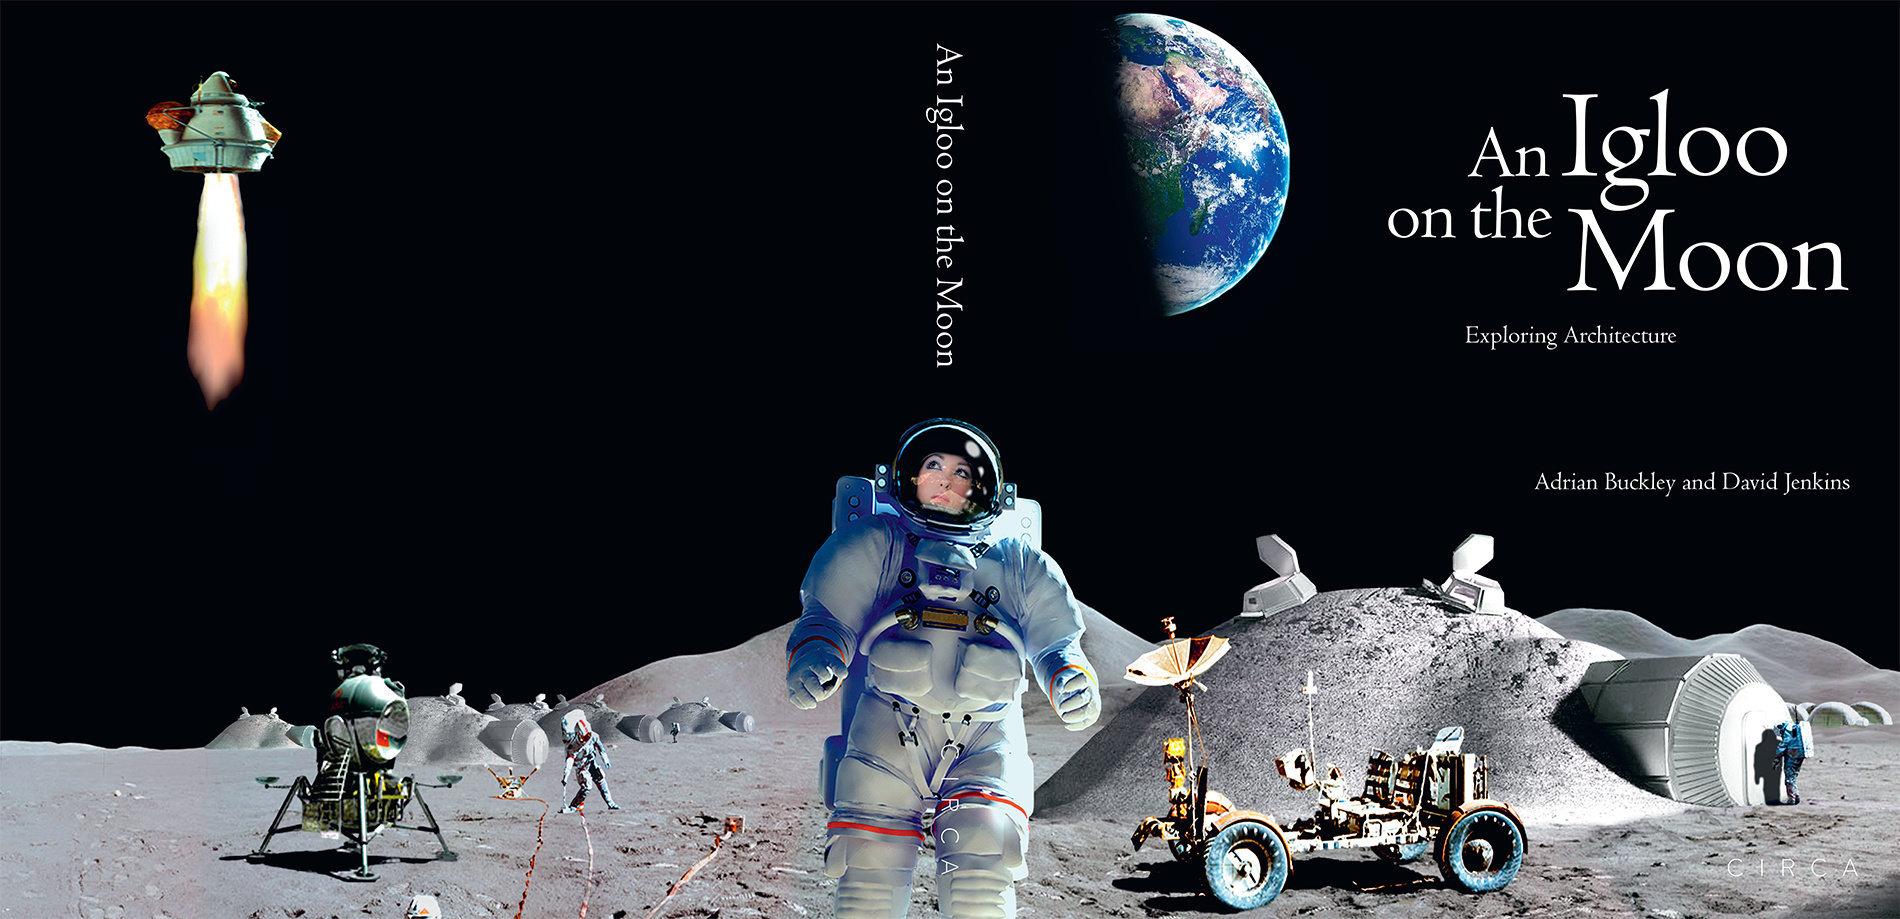 An Igloo on the Moon